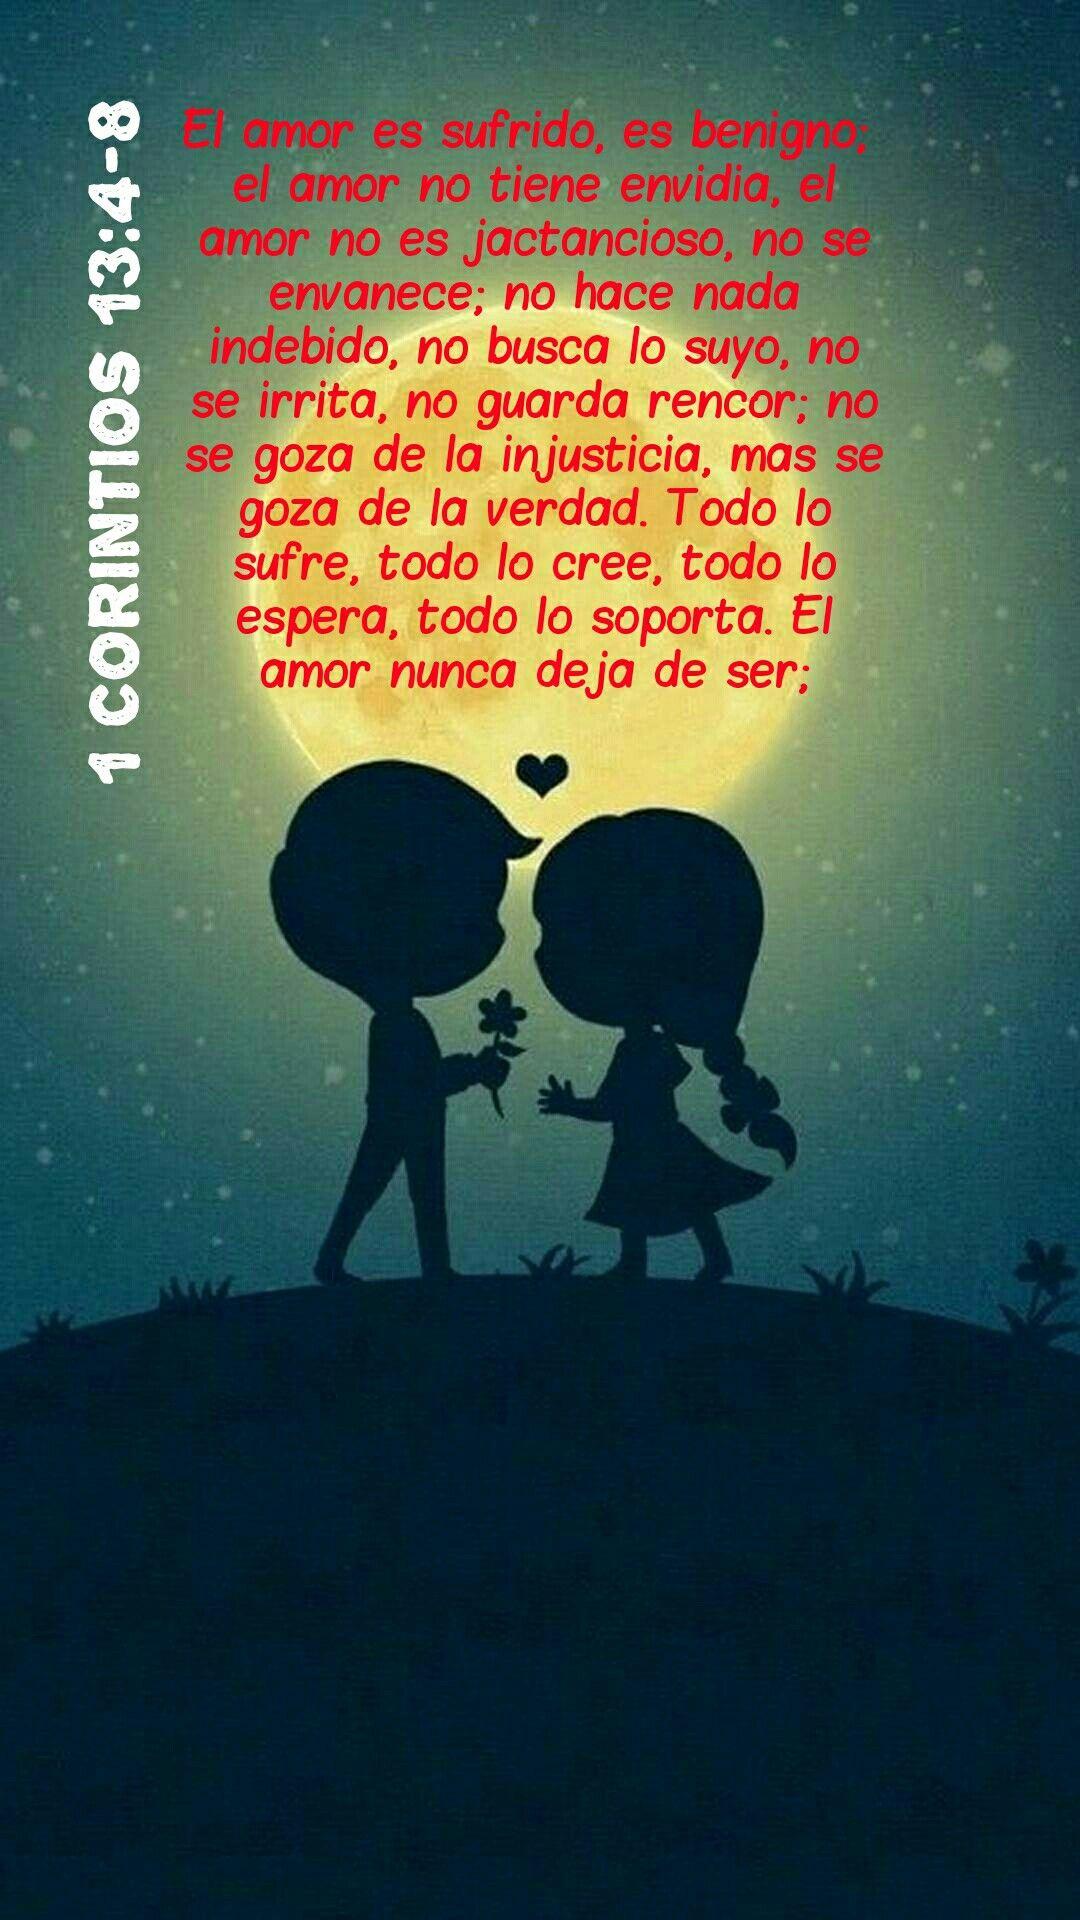 El Amor Nunca Deja De Ser 1 Corintios 13 4 8 Matrimonio Frases